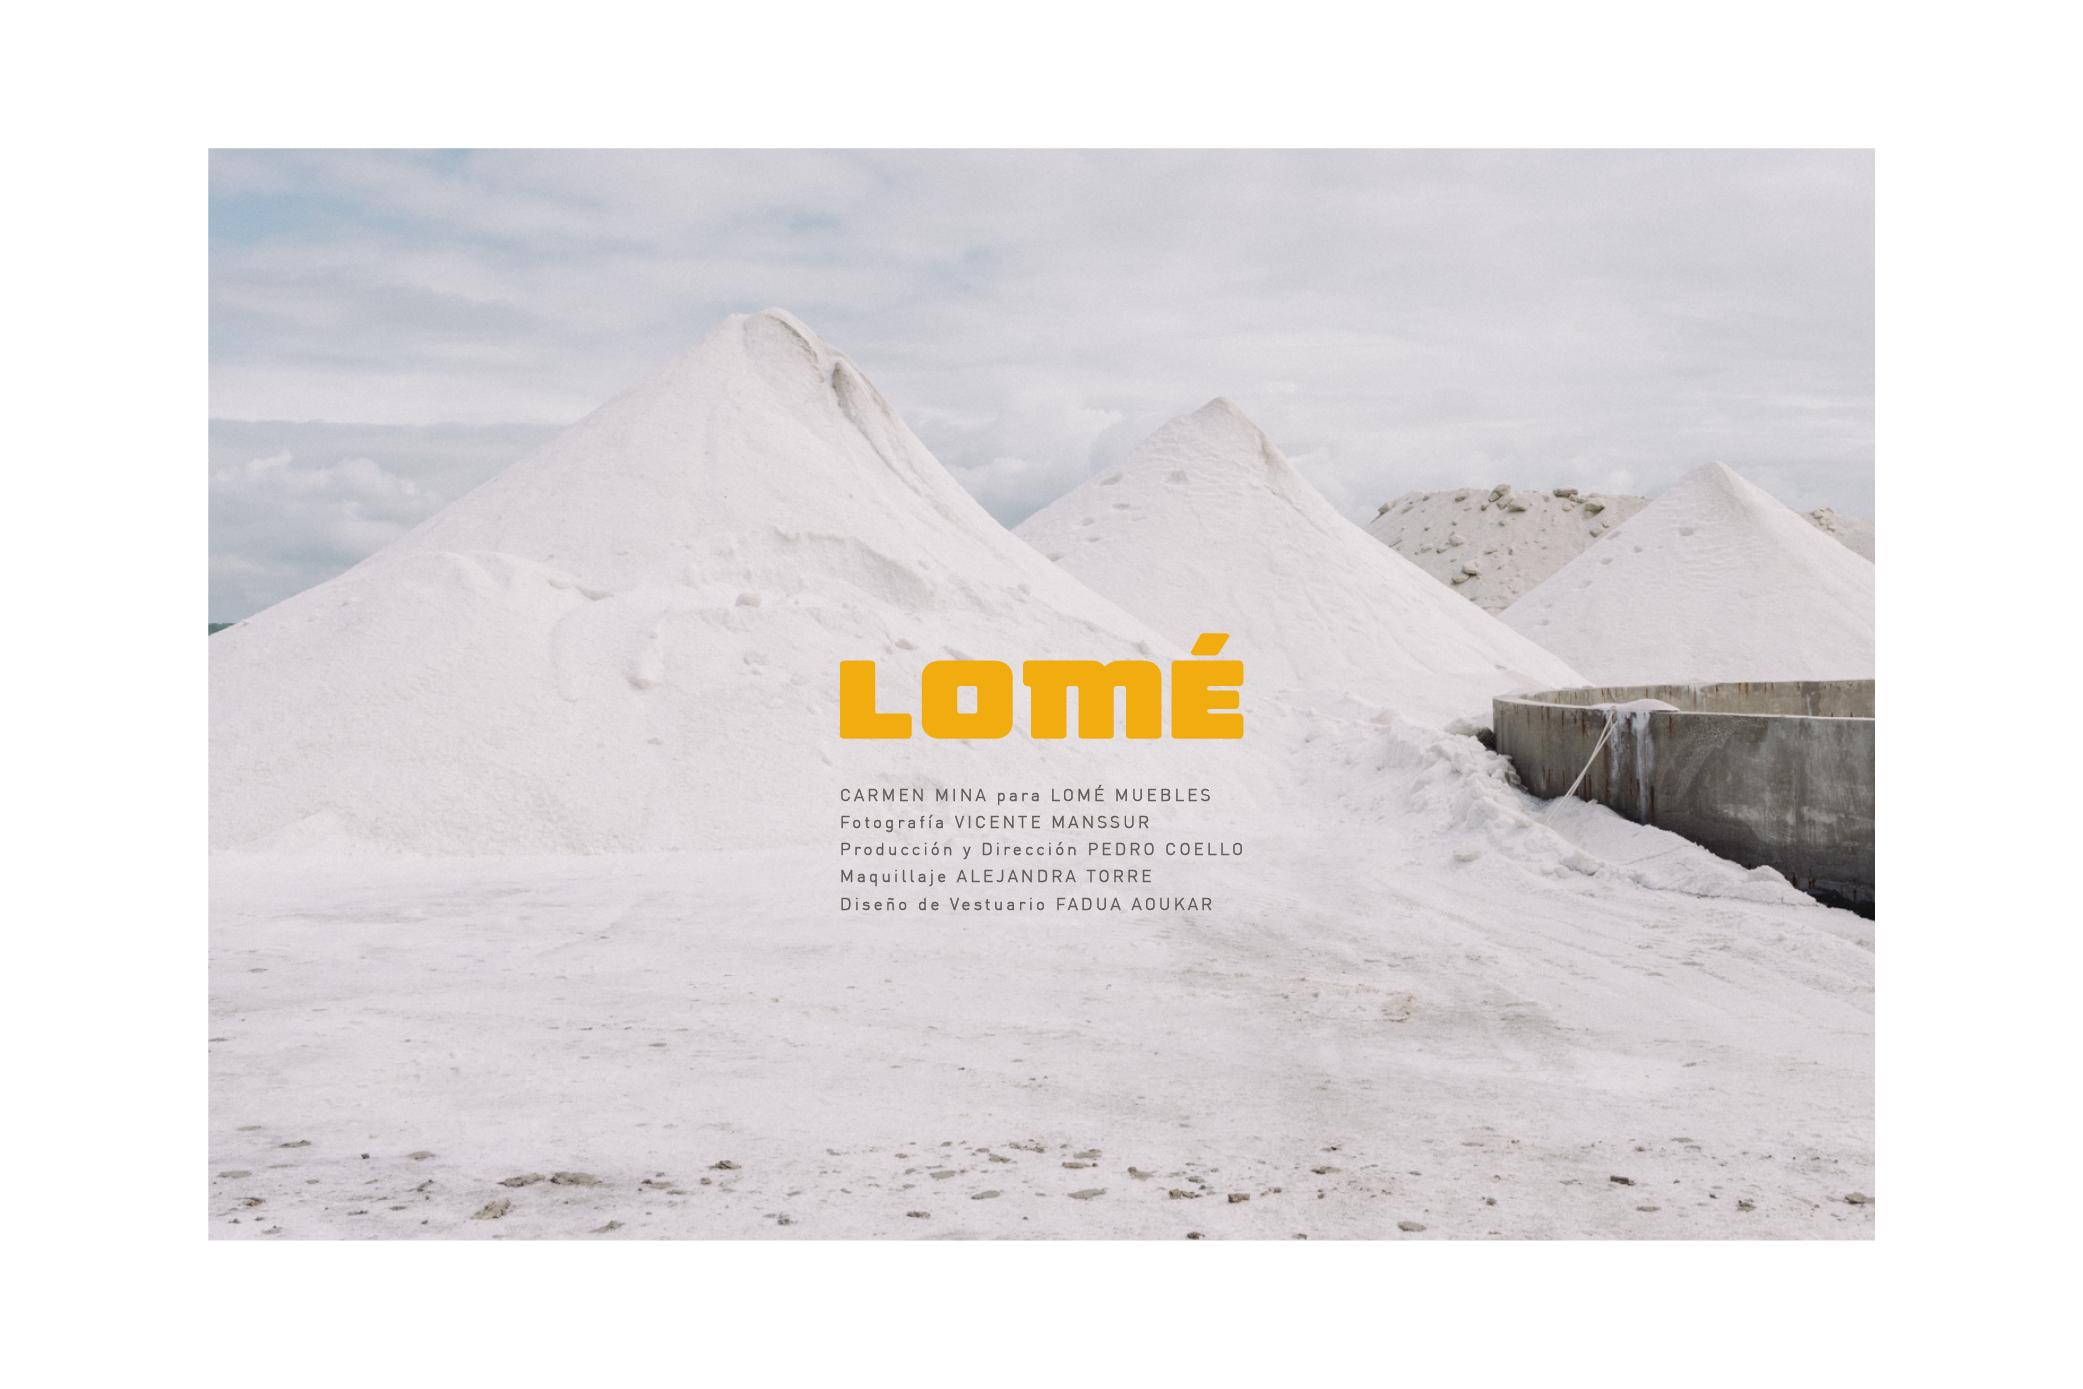 LOMÉ WEB1.jpg